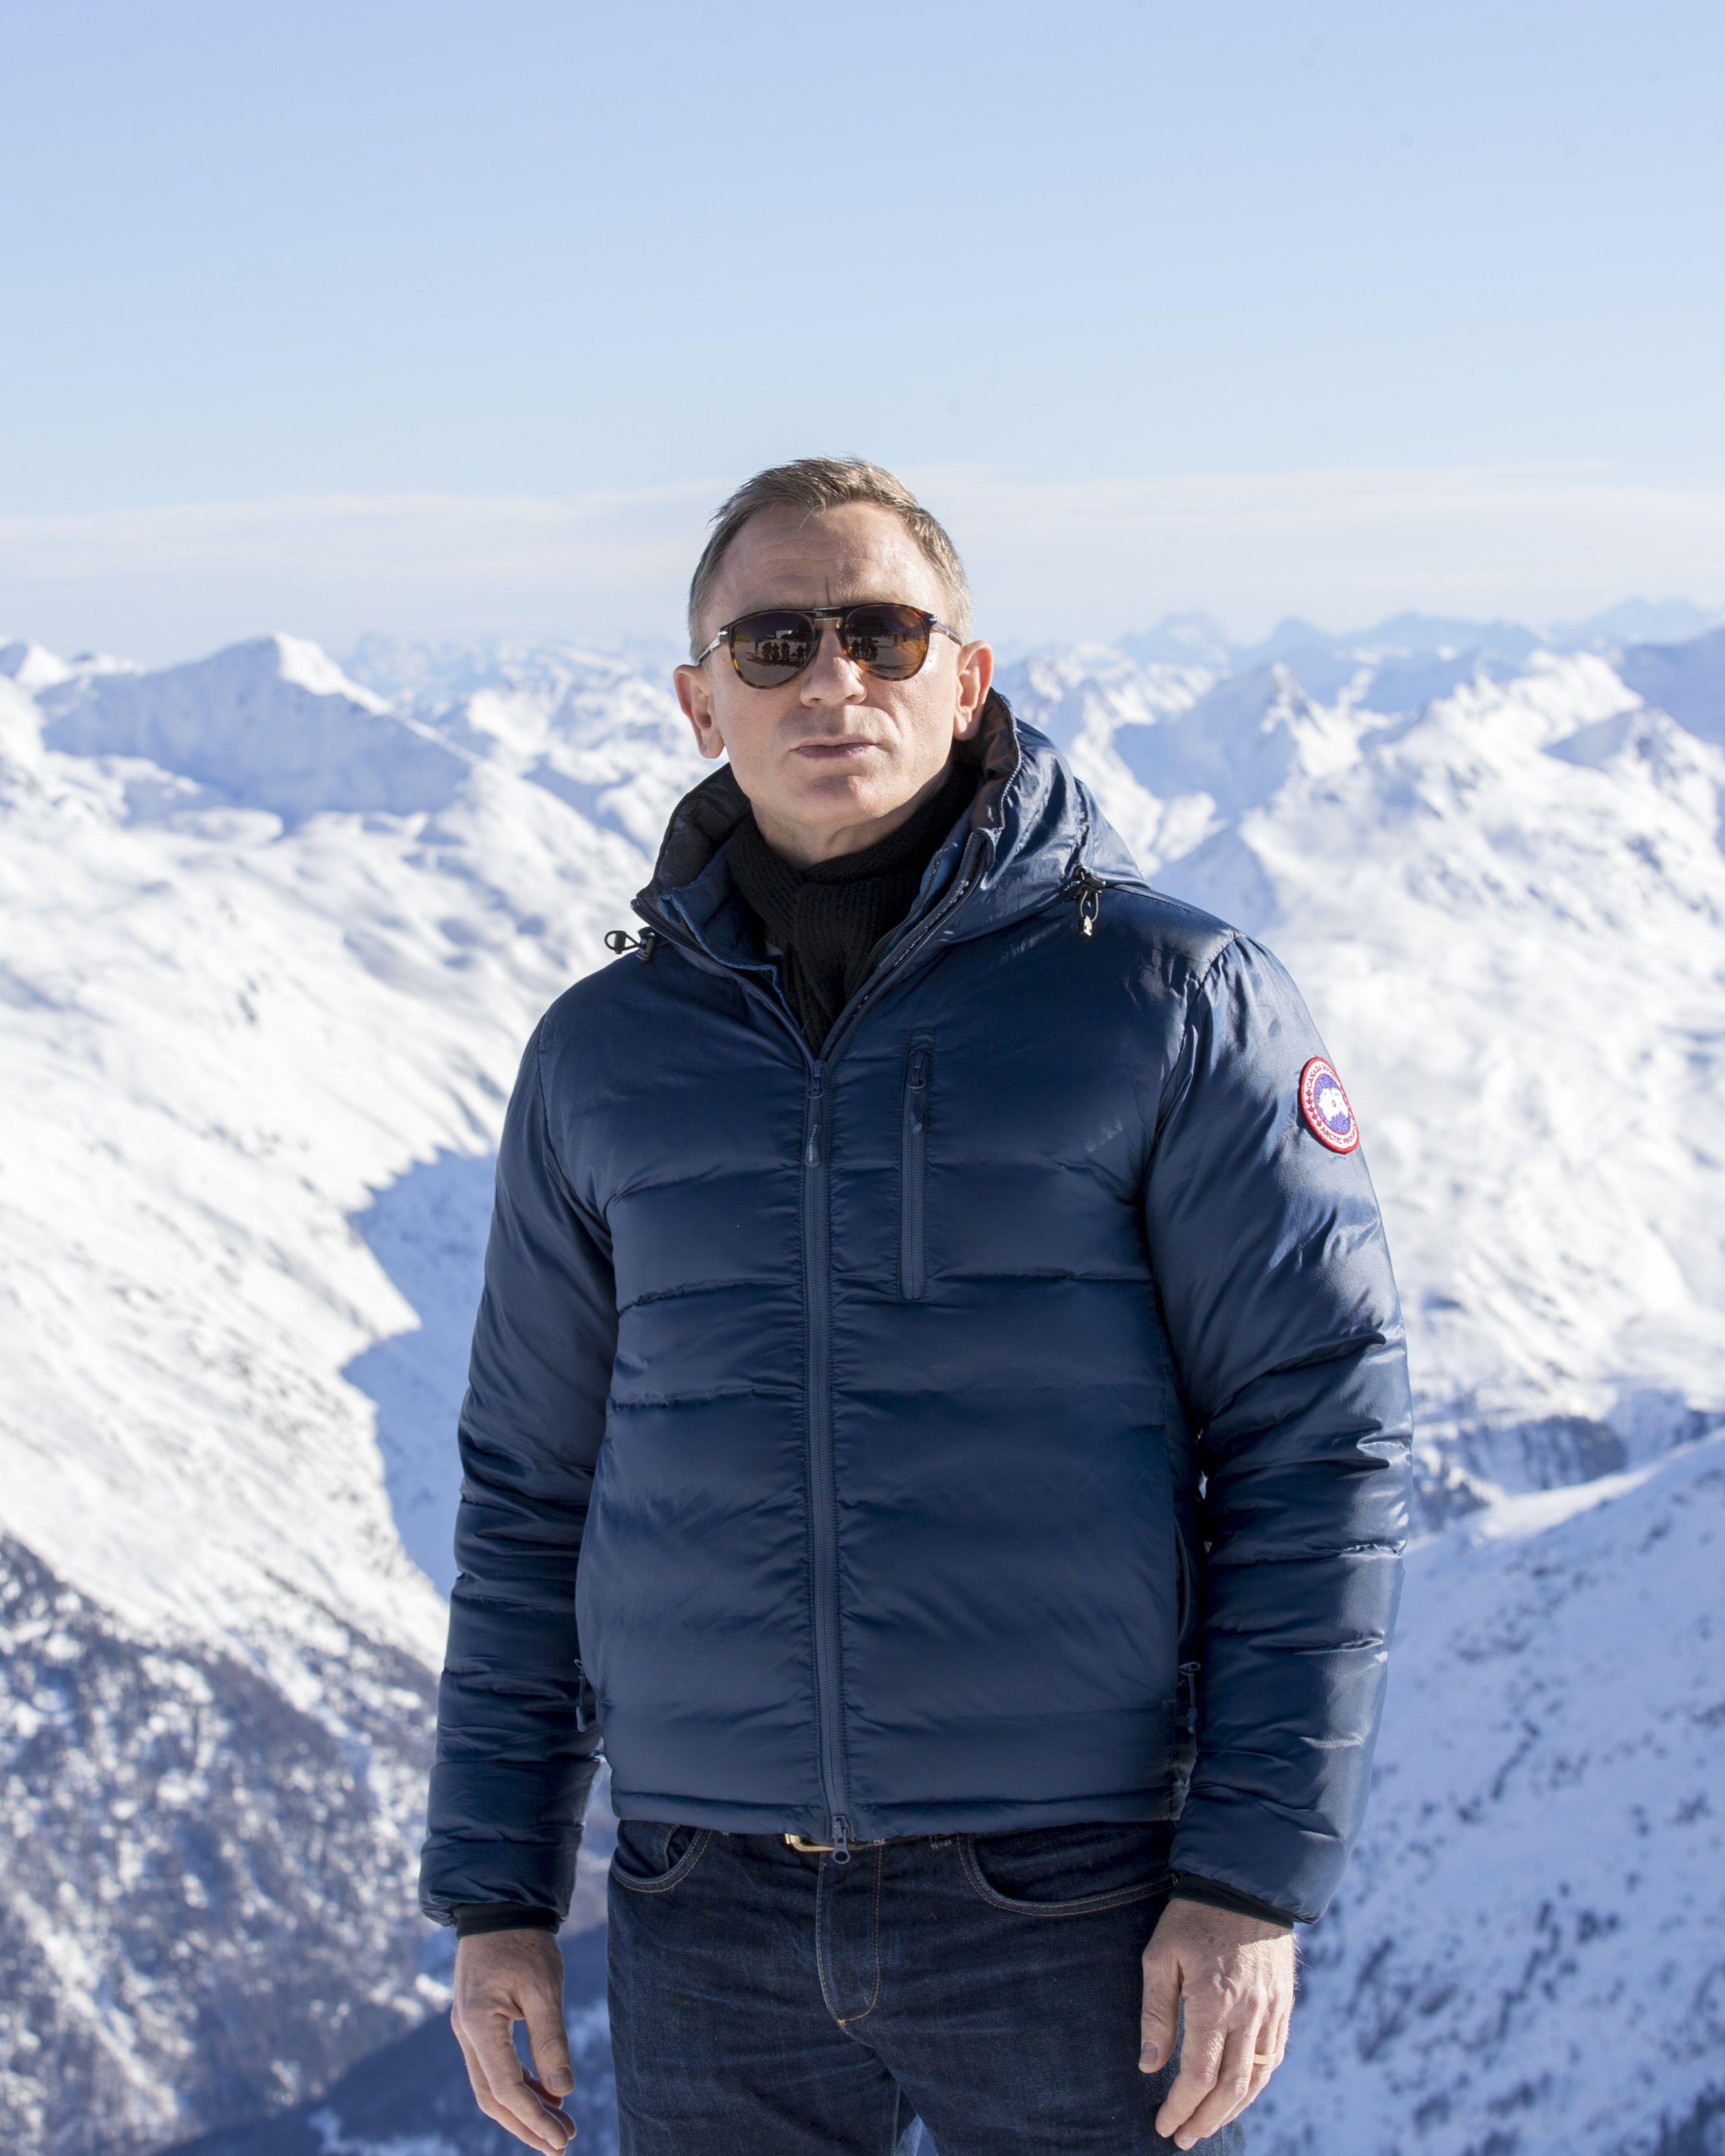 2. Daniel Craig